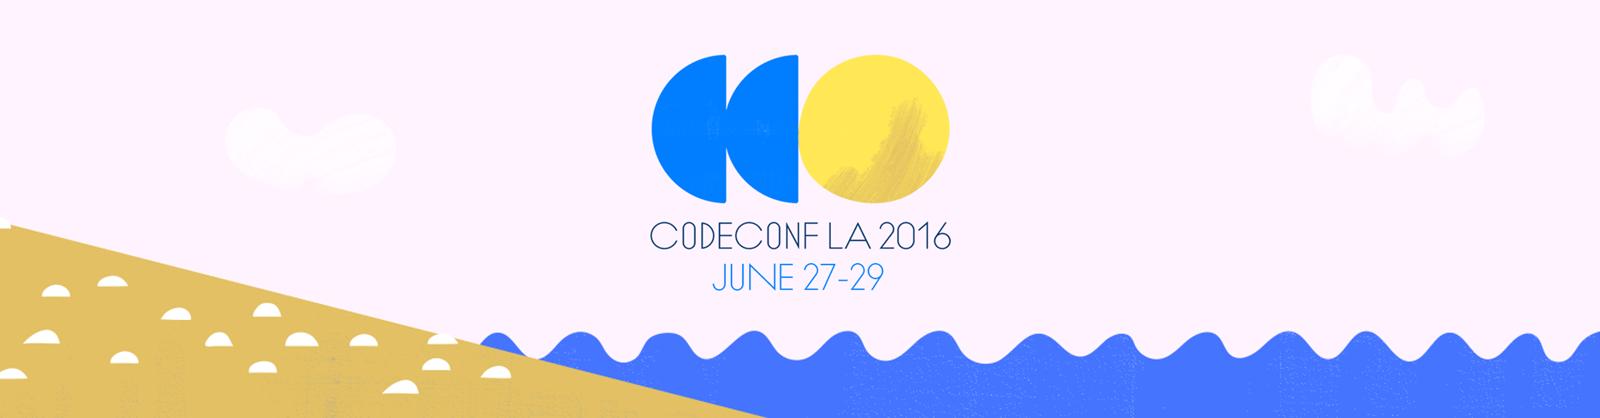 CodeConf LA June 27-29